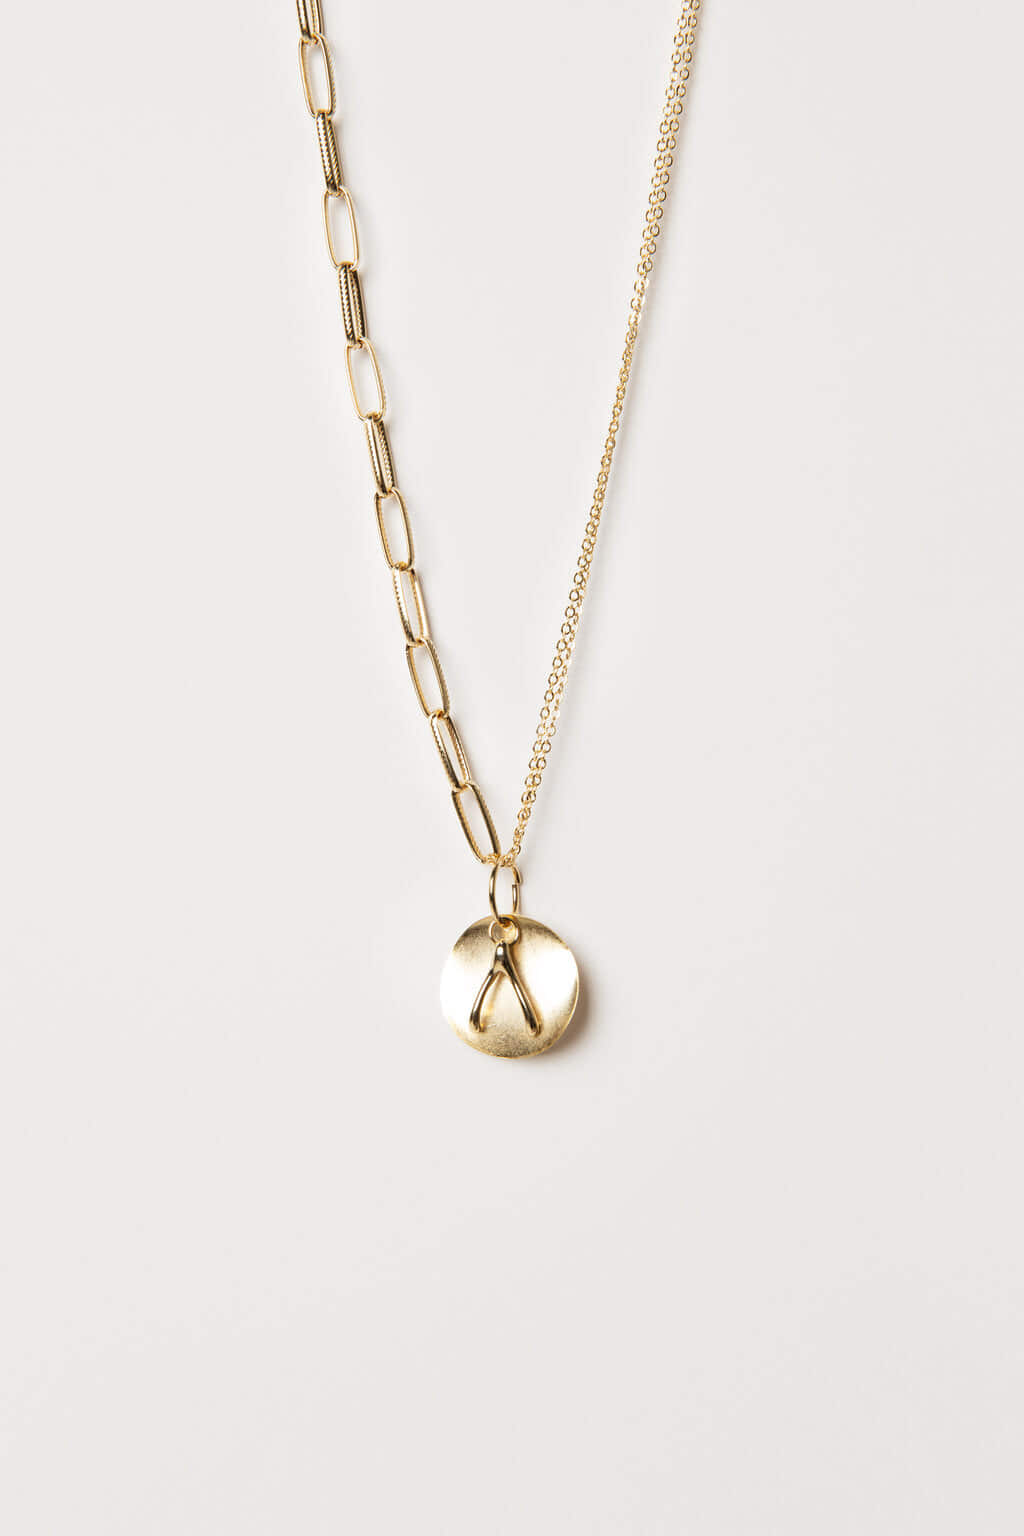 Necklace K009 Gold 2